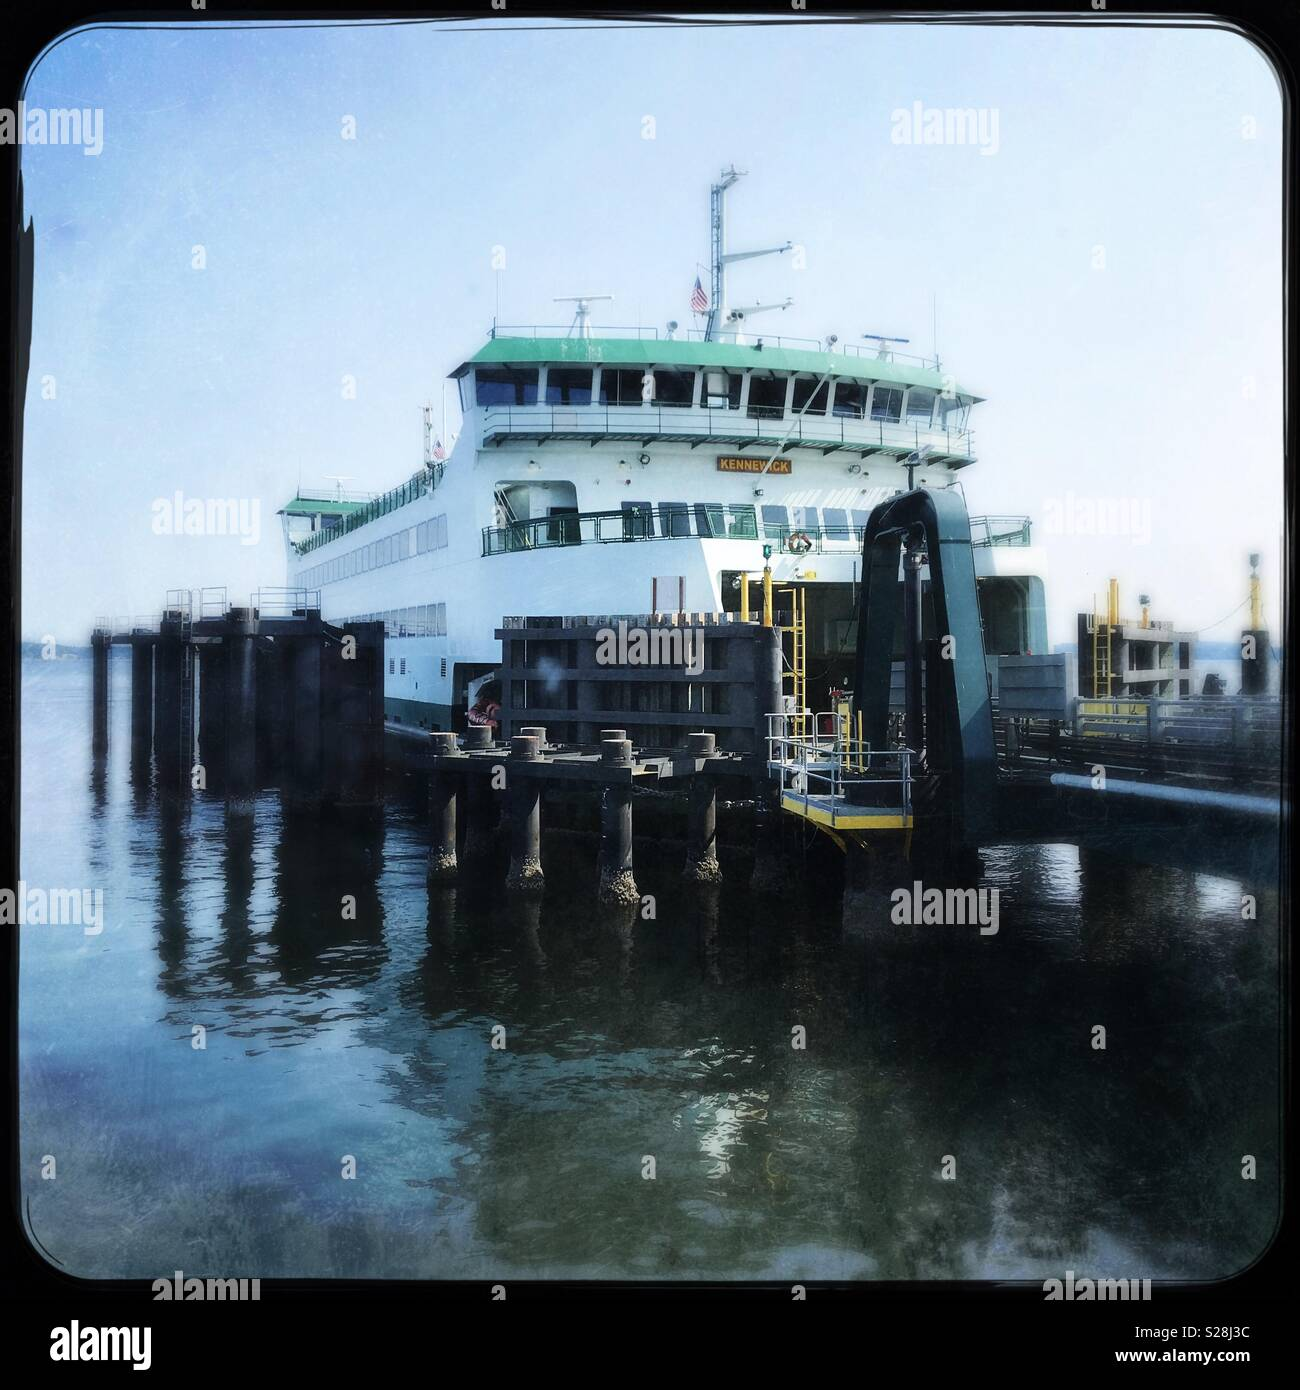 Washington State Ferry, the Kennewick - Stock Image